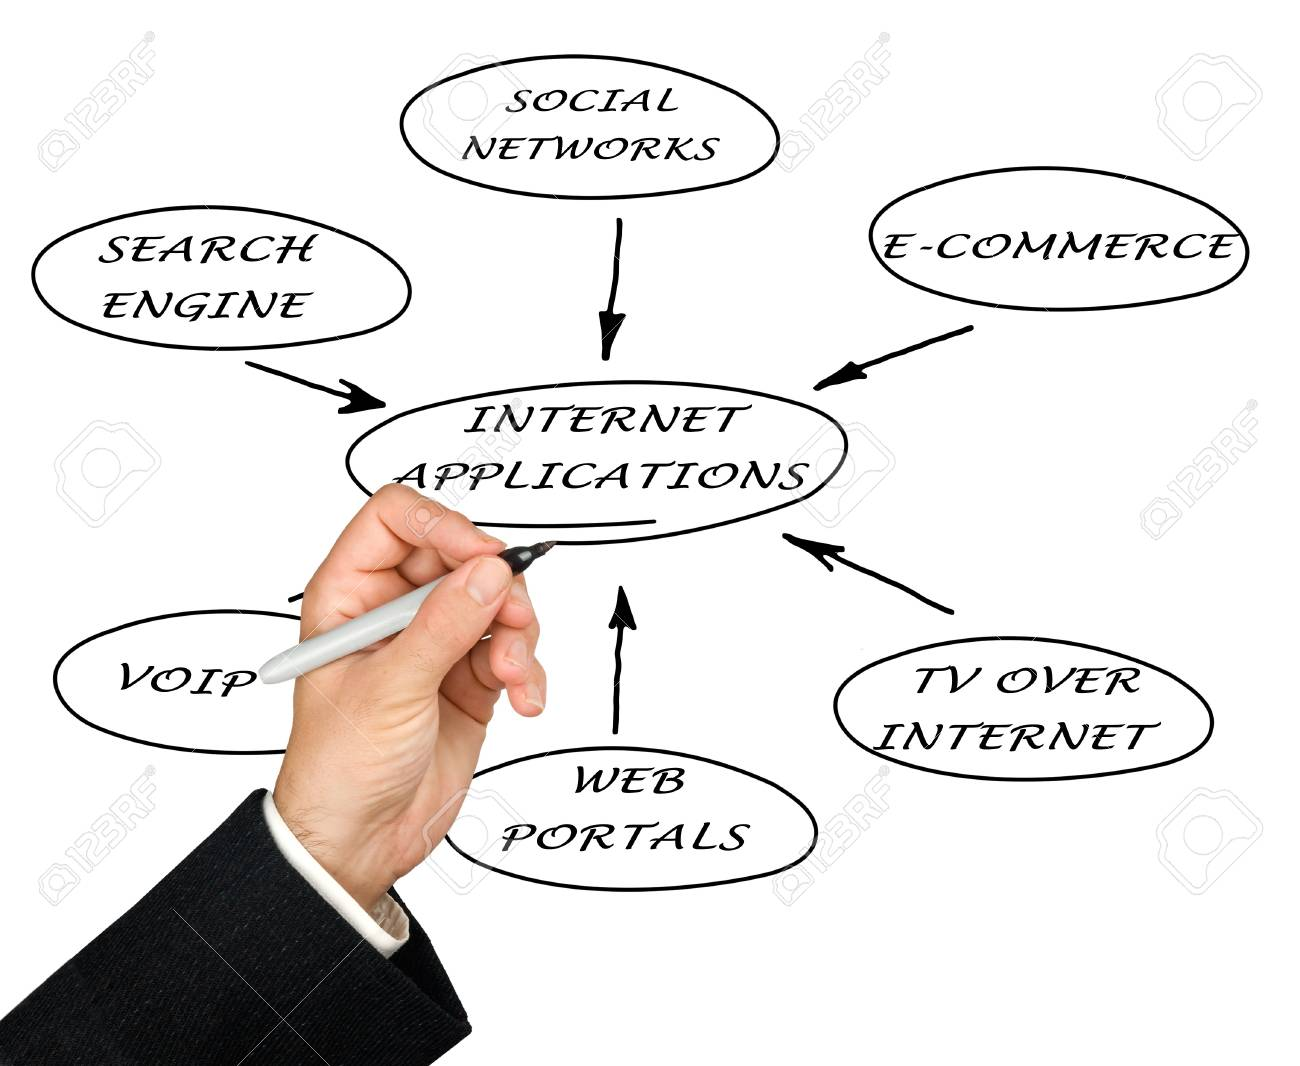 Presentation of internet applications Stock Photo - 10658590